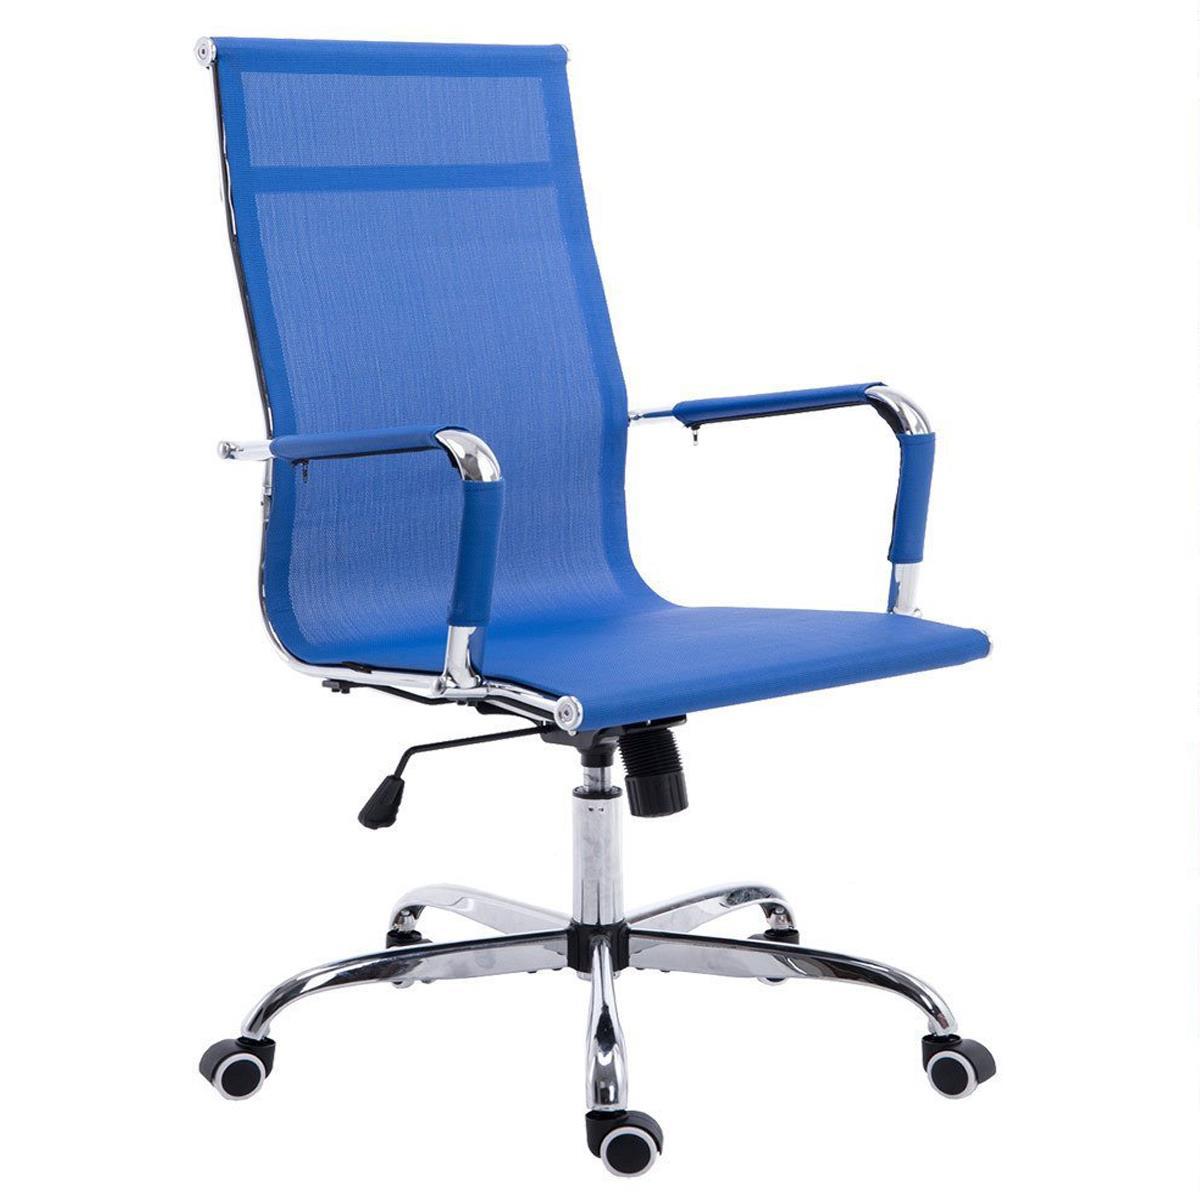 Silla de oficina italica en color azul silla de oficina for Sillas de diseno para oficina